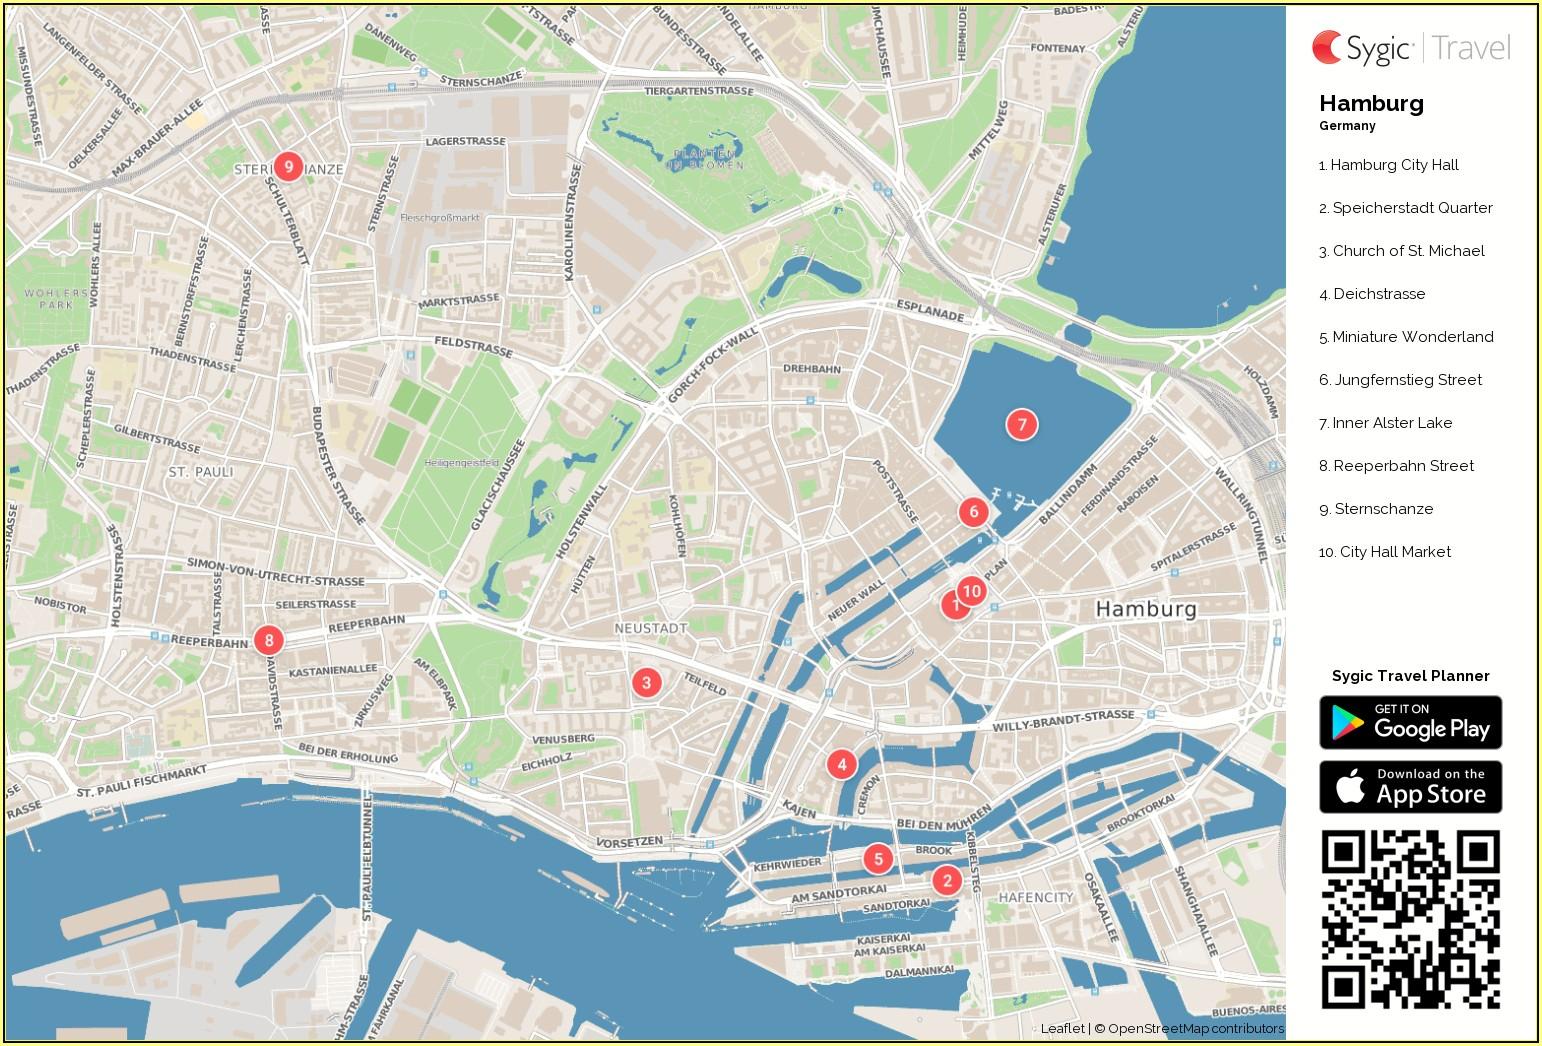 Hamburg City Centre Street Map